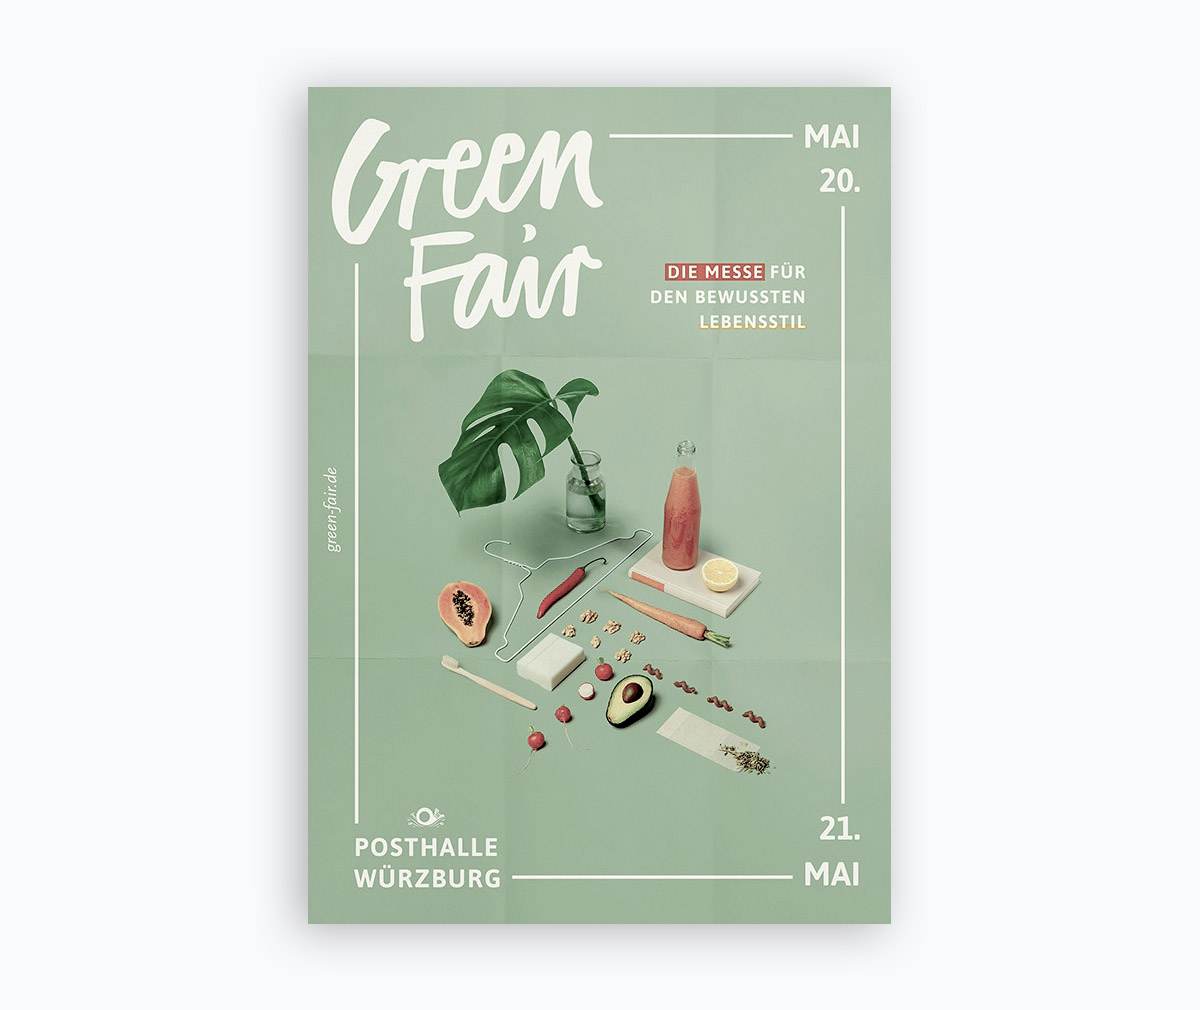 flyer examples - green fair flyer